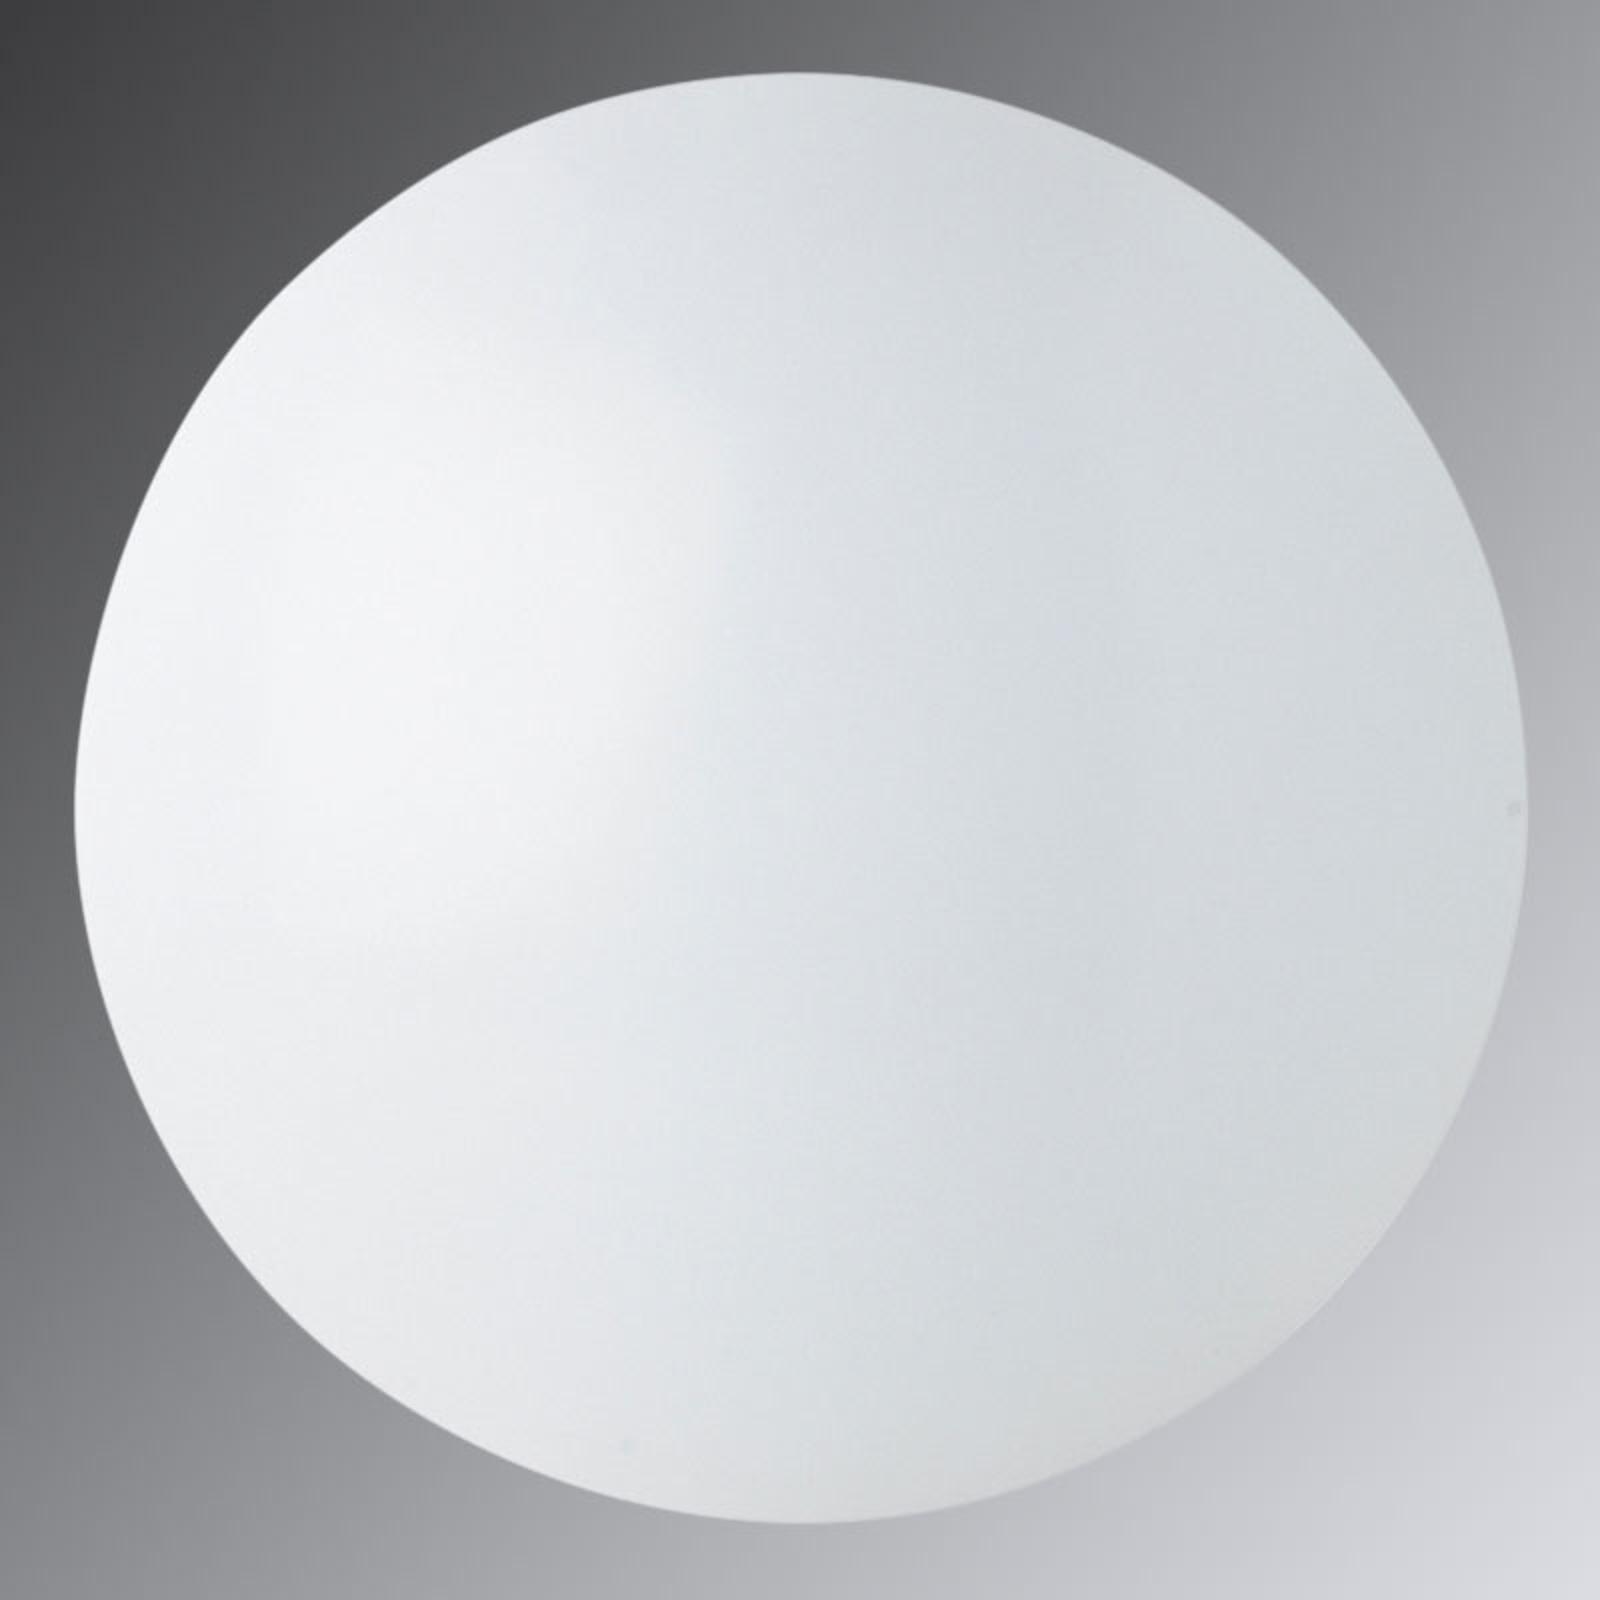 LED-kattovalaisin Renzo, 22 W, 3 000 K